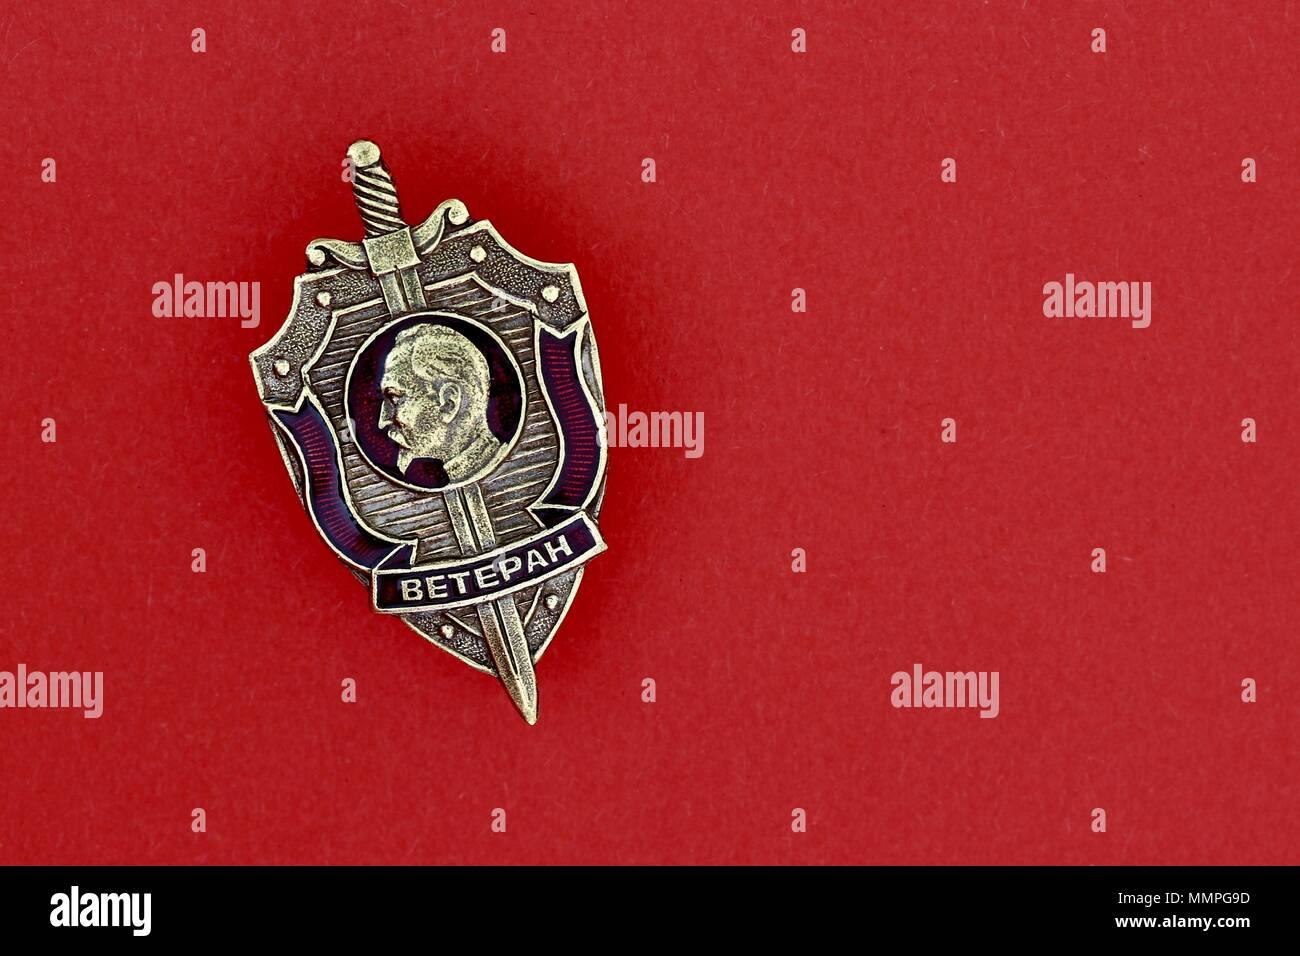 Close up of a Soviet KGB USSR Russian veteran medal. Profile of Felix Dzerzhinsky. Brass metal and enamel badge. Red background. - Stock Image